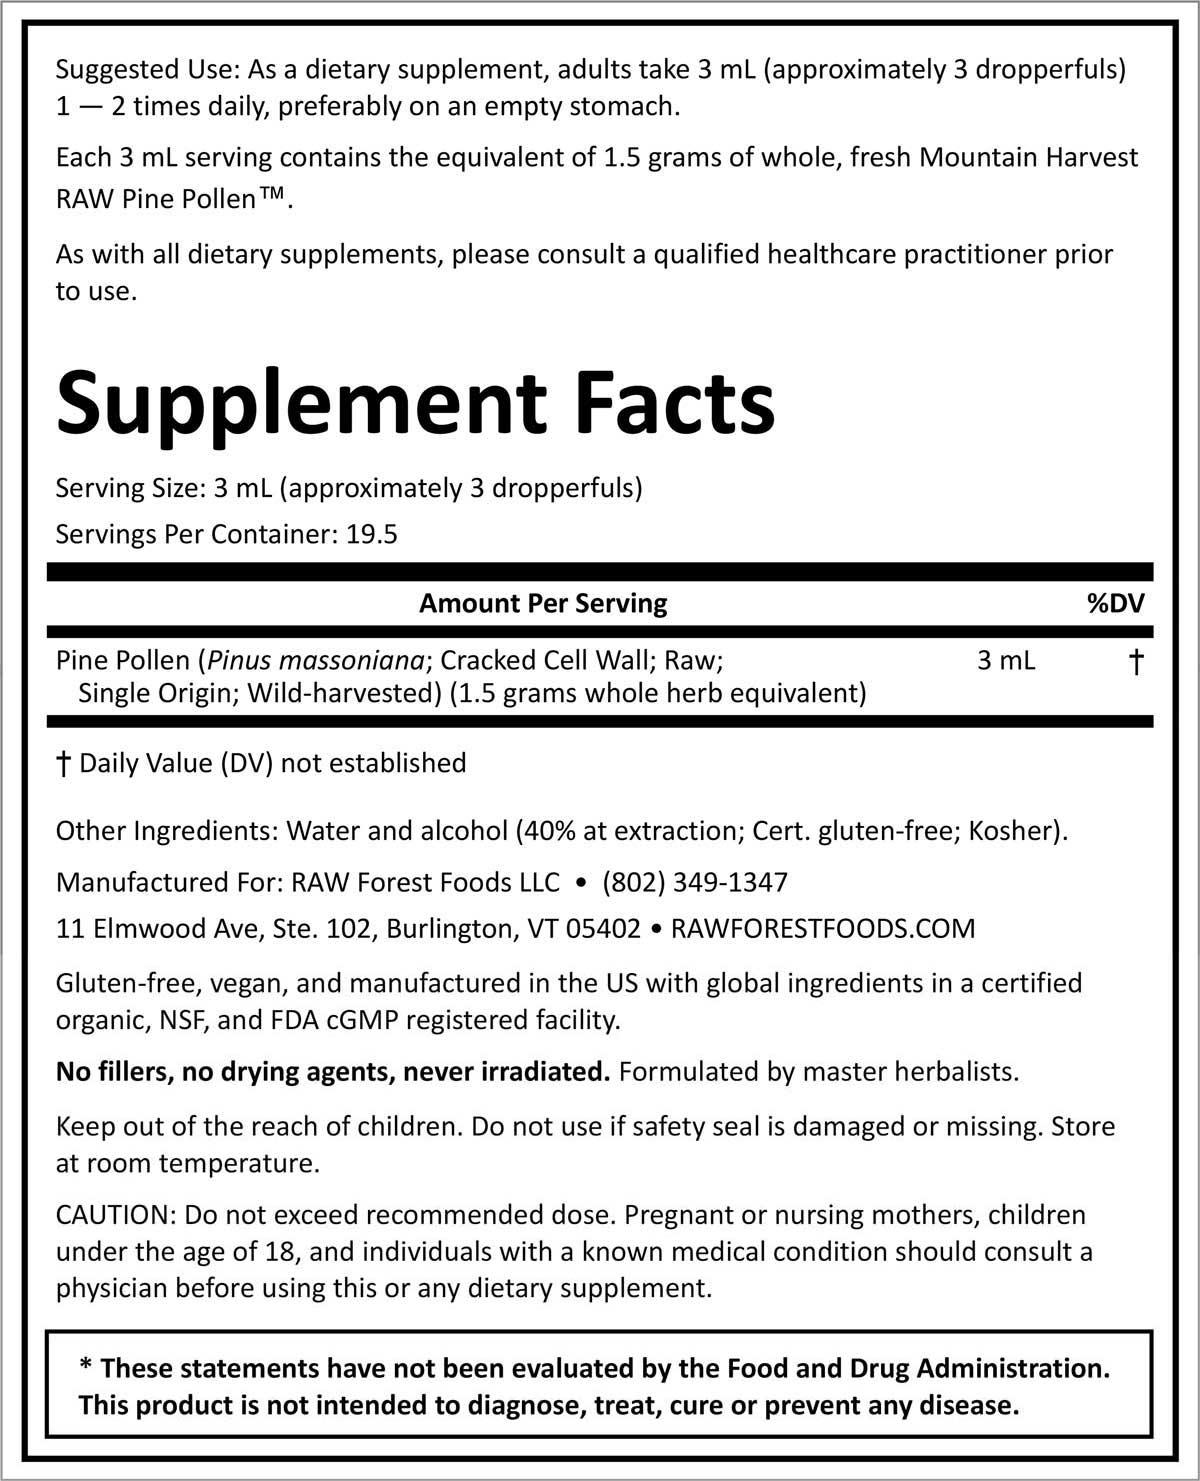 royal-pine-pollen-tincture-supplement-facts-2-ounce.jpg